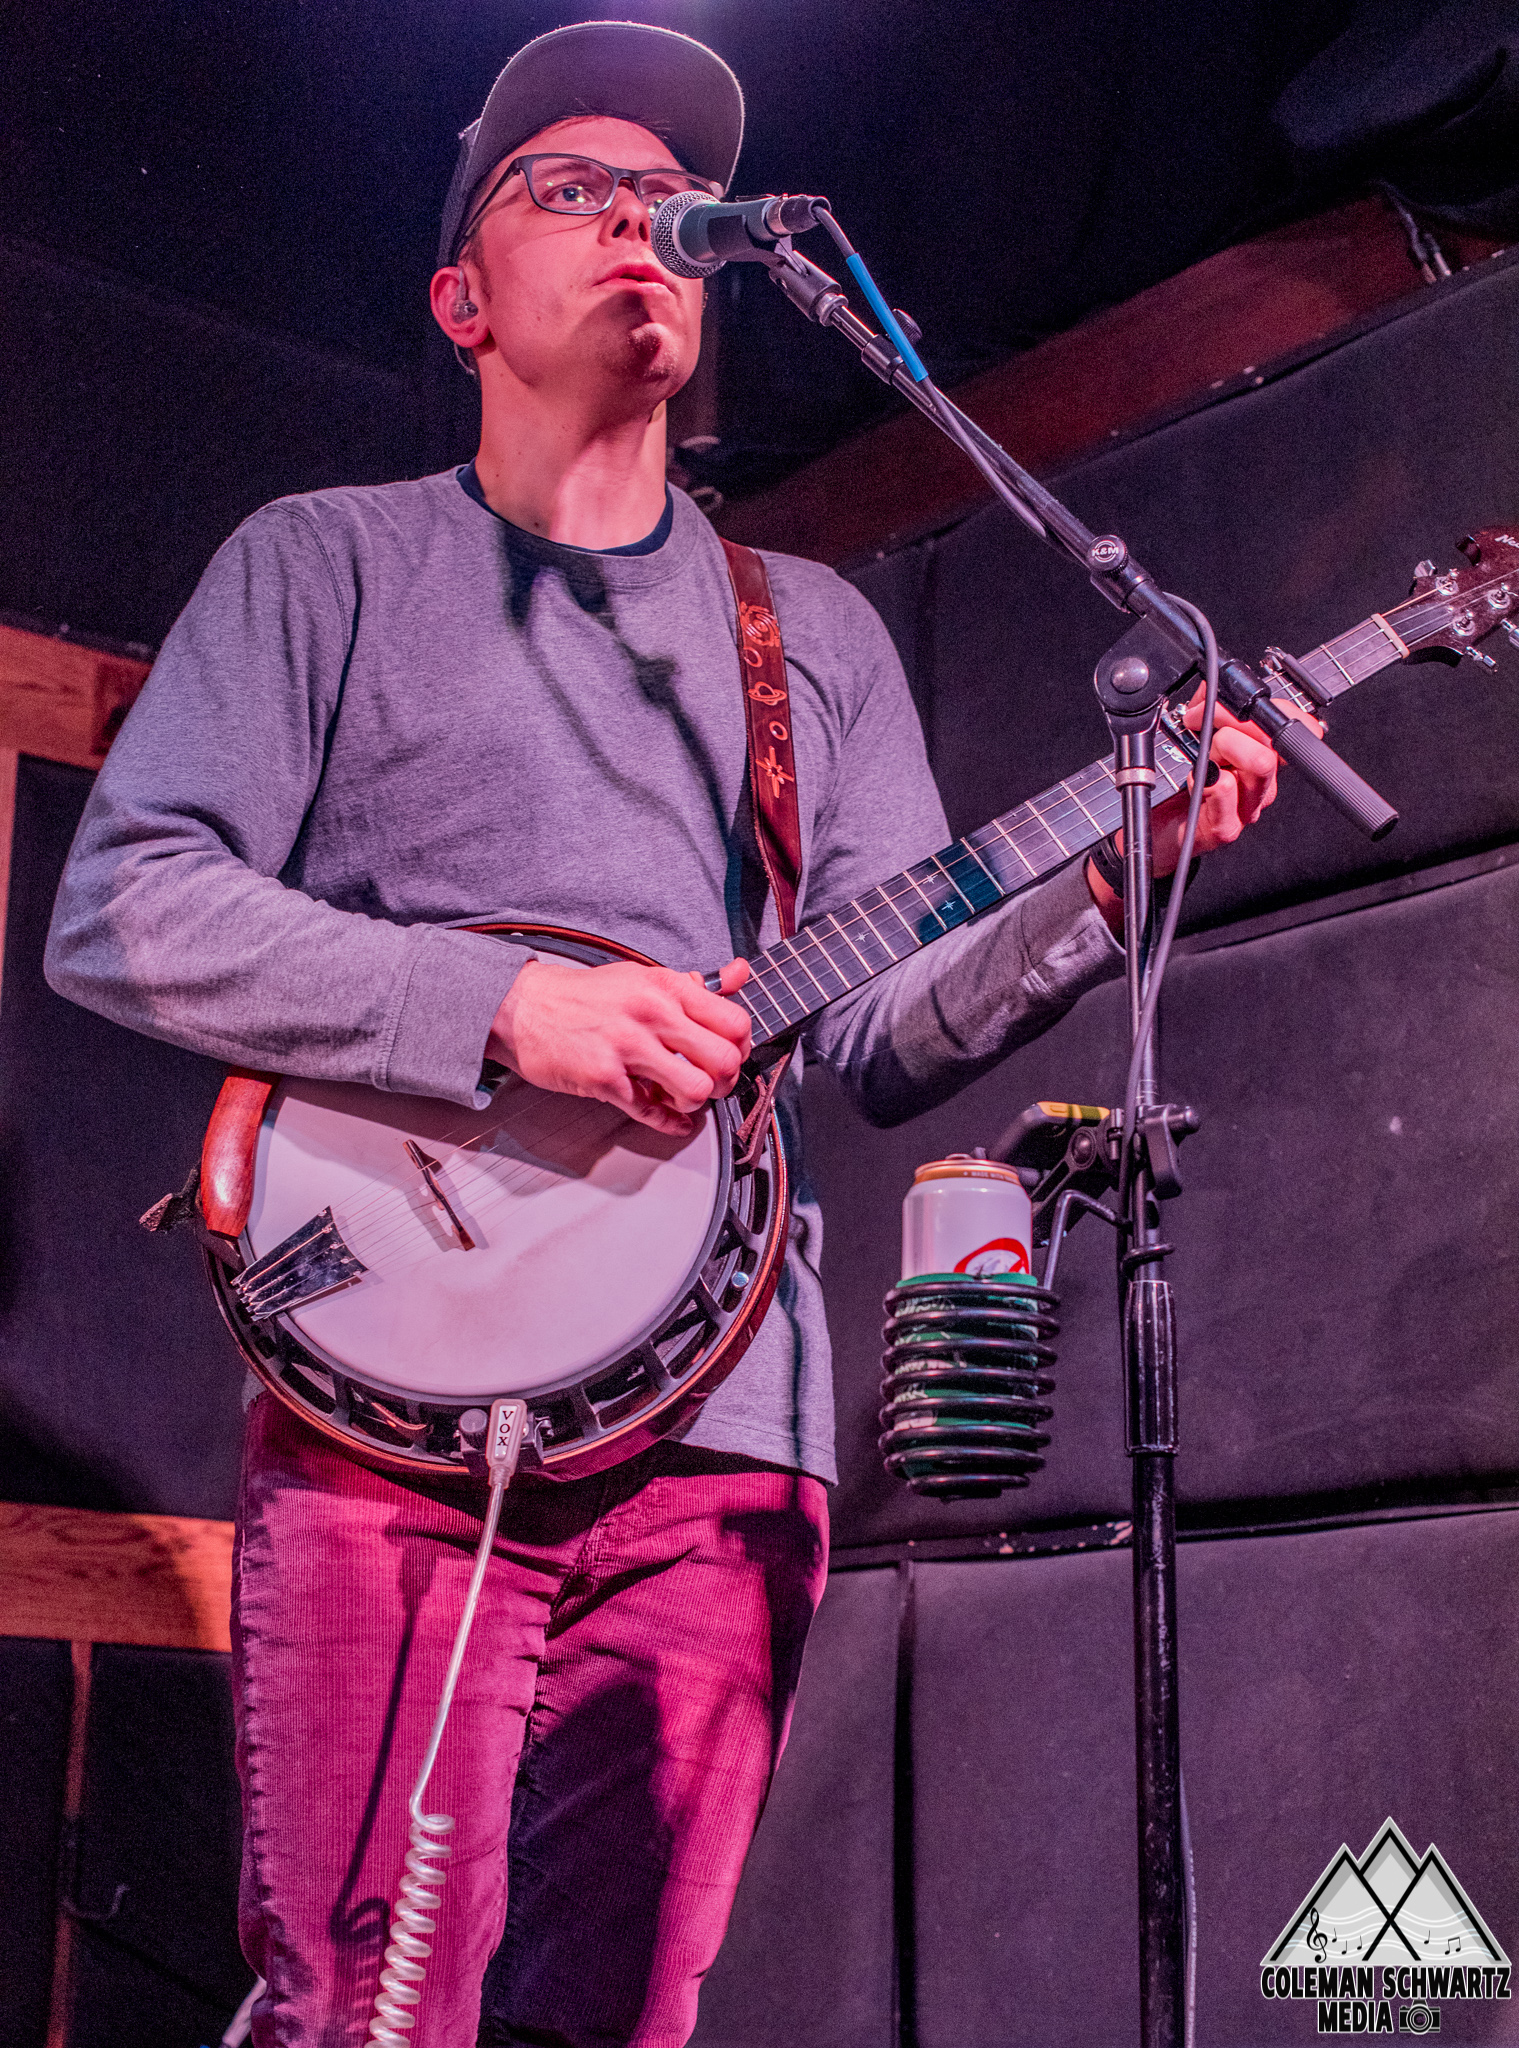 Coleman Schwartz (2018)